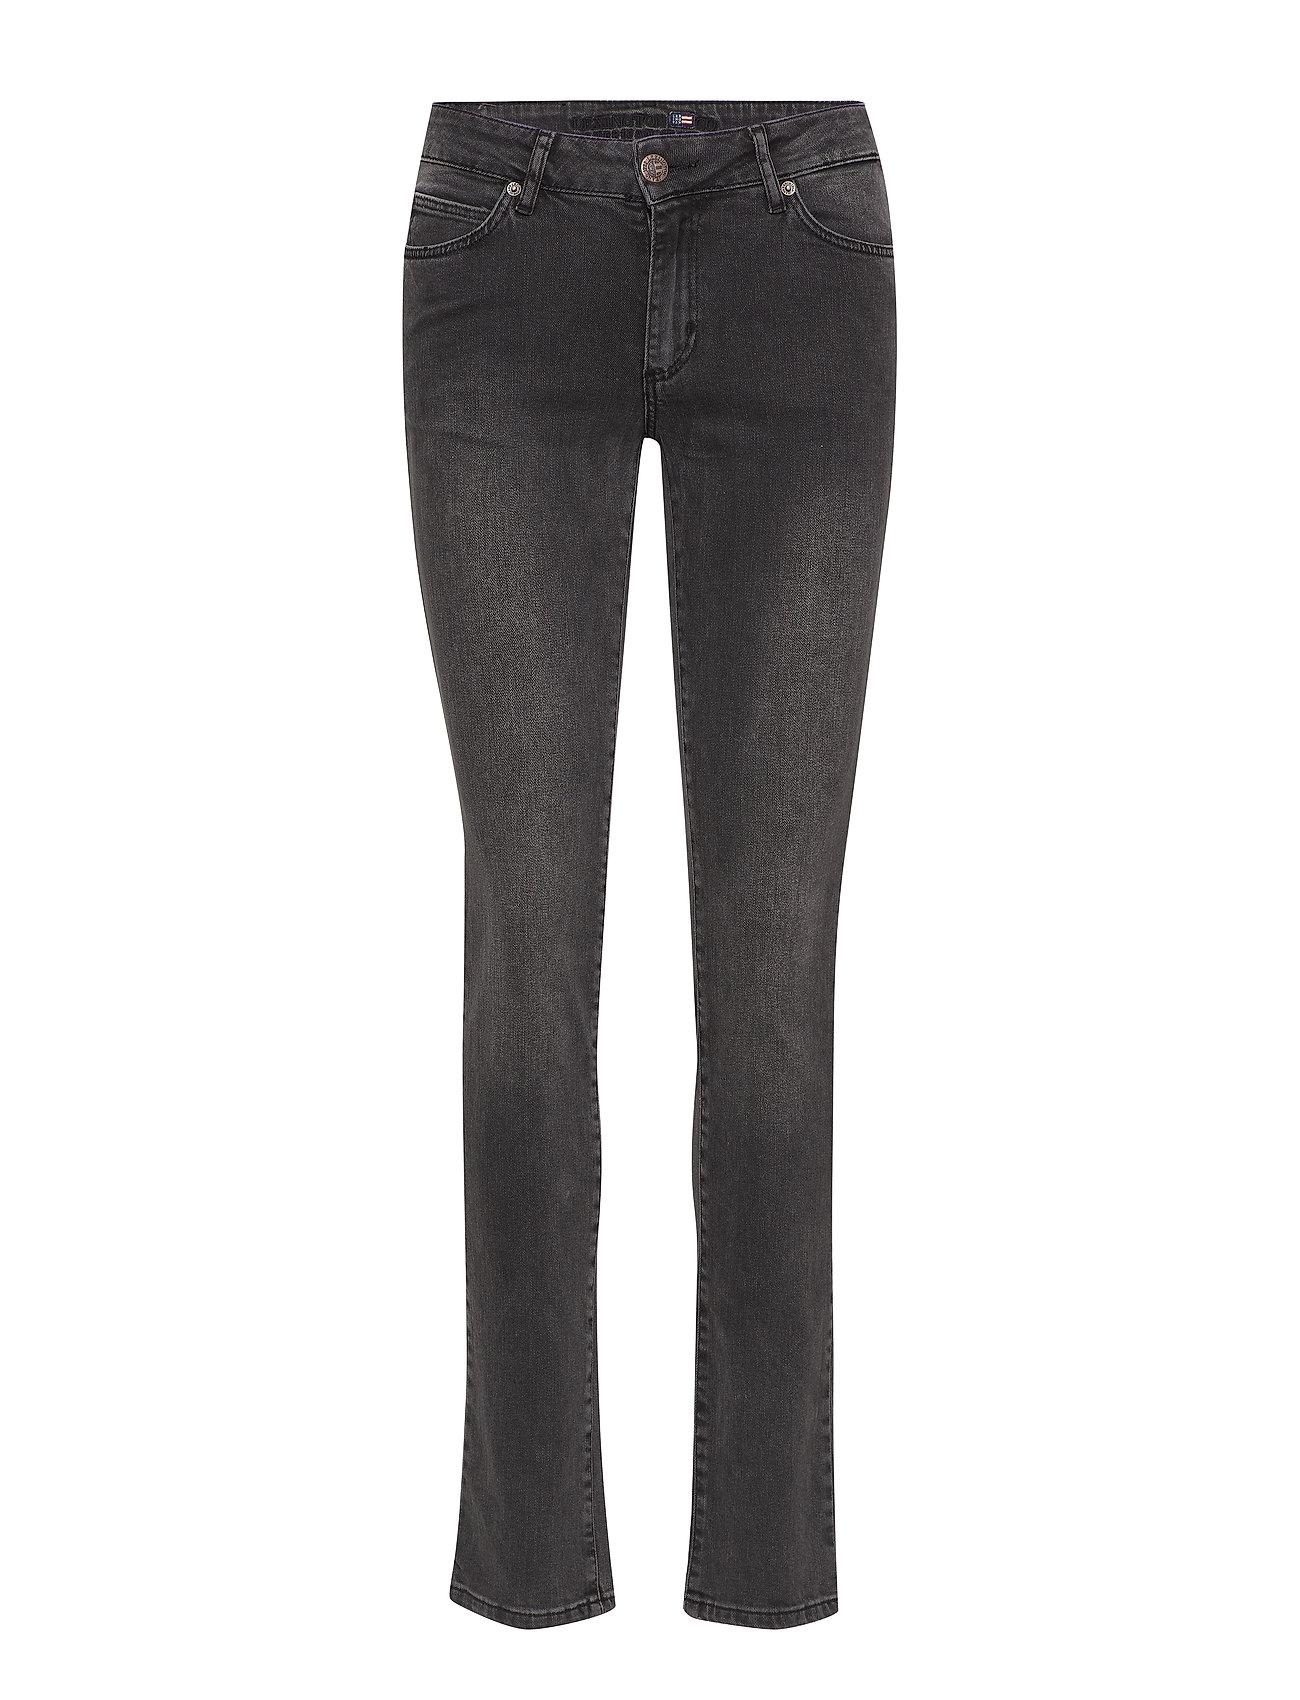 Lexington Clothing Casey Gray Jeans - DK GRAY DENIM